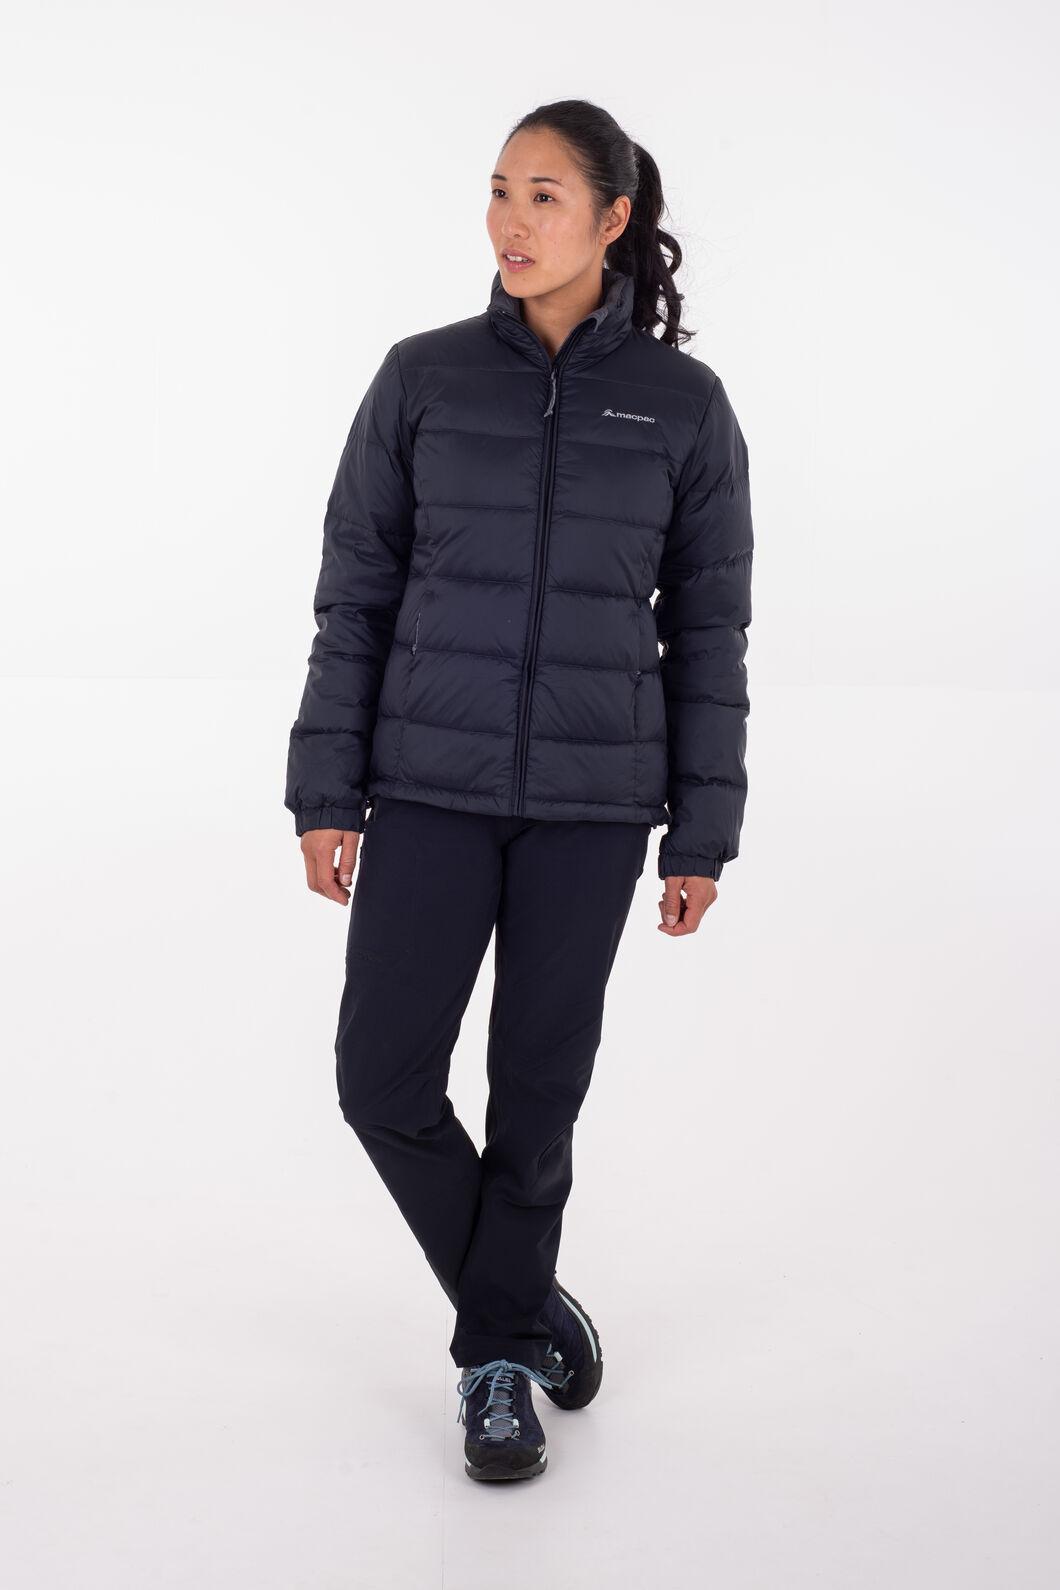 fabbfd2ed Macpac Halo Down Jacket - Women's | Macpac